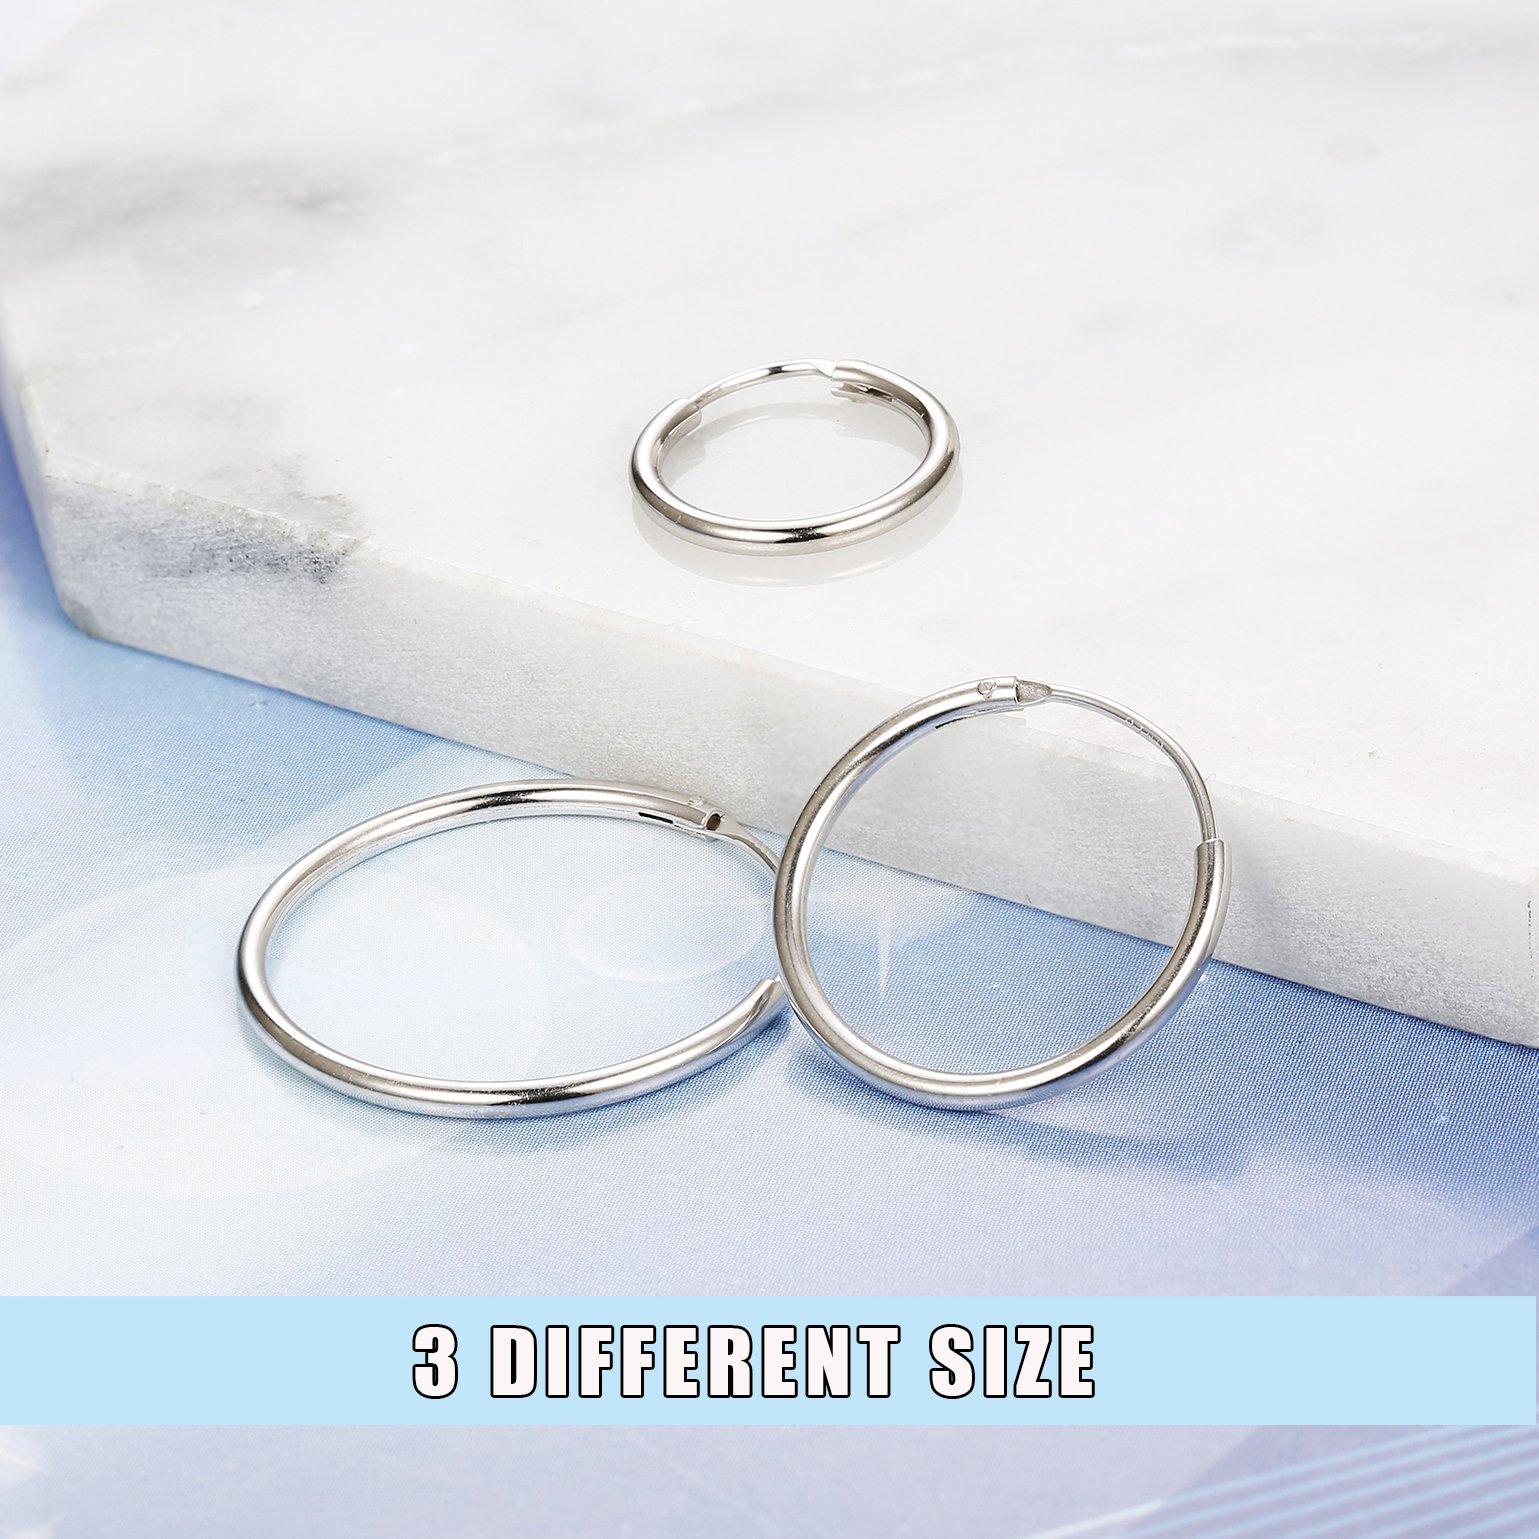 FUNRUN JEWELRY 3 Pairs Sterling Silver Hoop Earrings for Women Men Round Earrings Set 10-40MM (B: Platinum-Plated 3 Pairs: 20MM/30MM/40MM) by FUNRUN JEWELRY (Image #4)